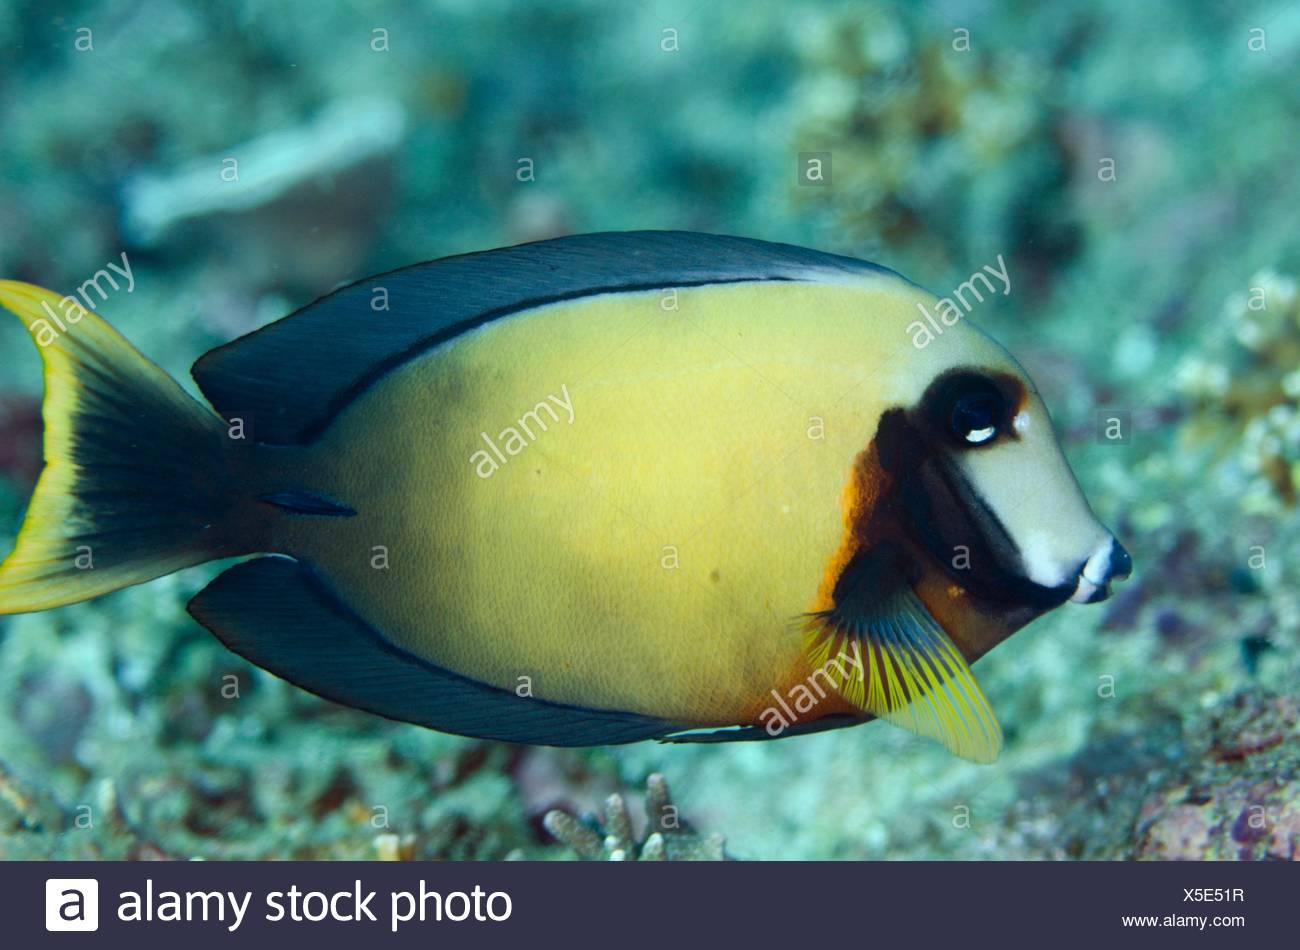 Imitieren Doktorfisch (Acanthurus Pyroferus), Crystal Lagoon Tauchen Ort Candidasa, Bali, Indonesien. Stockbild